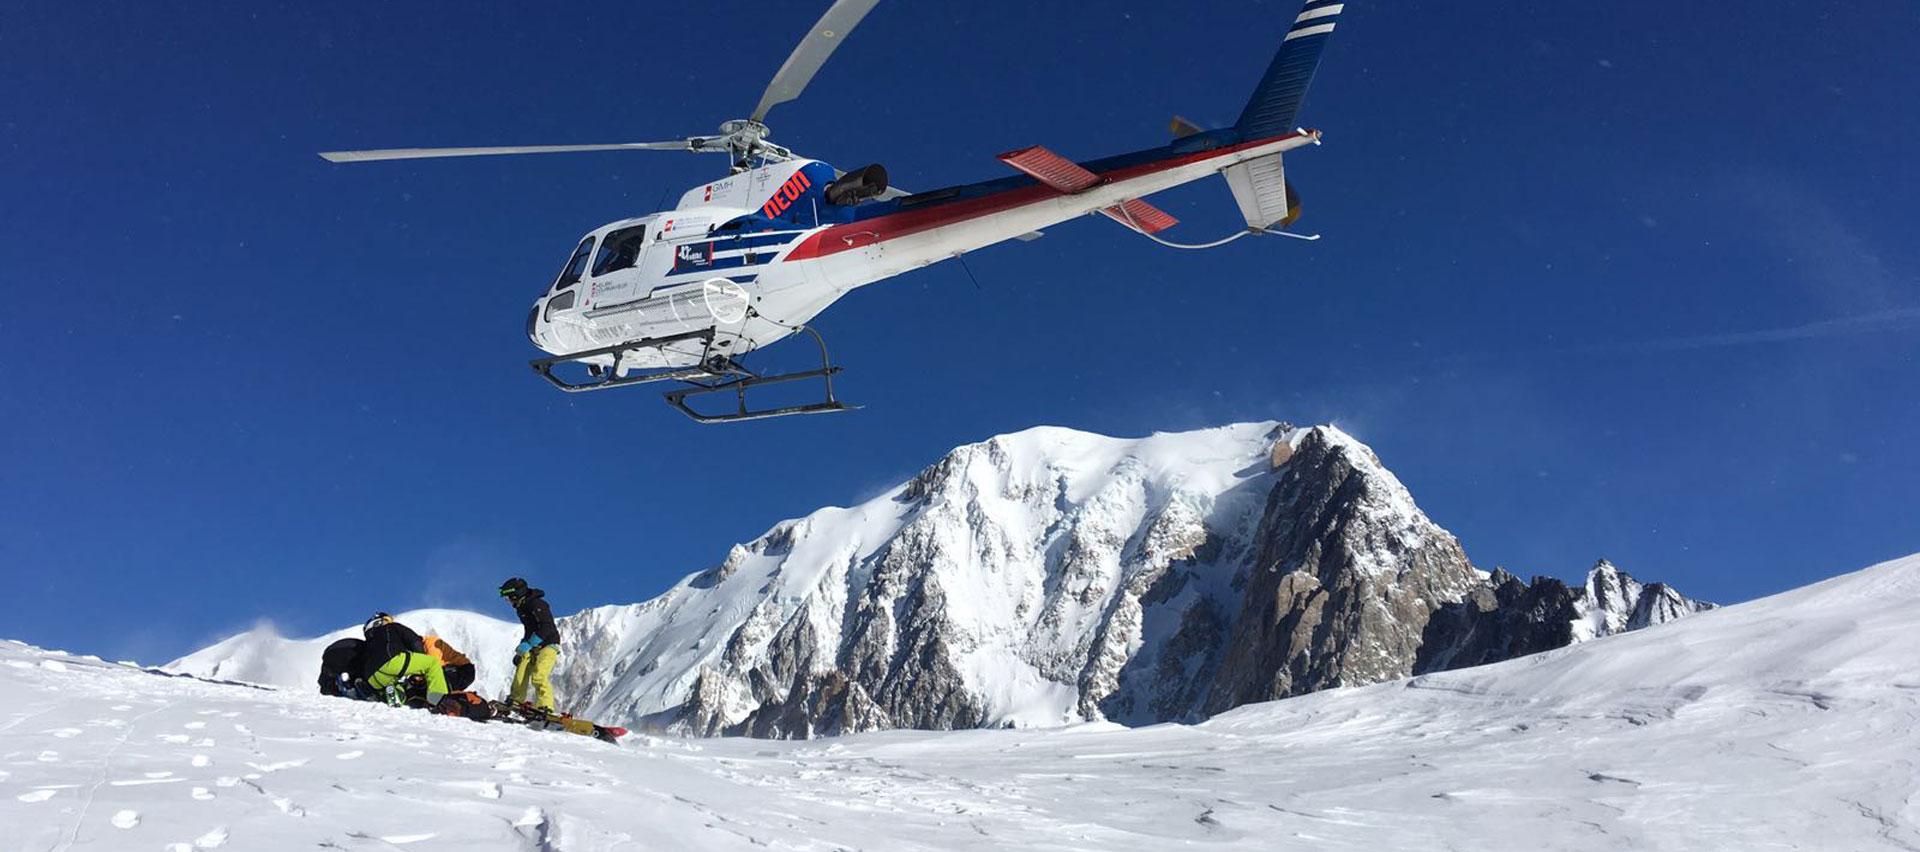 heli-ski-safari-winter